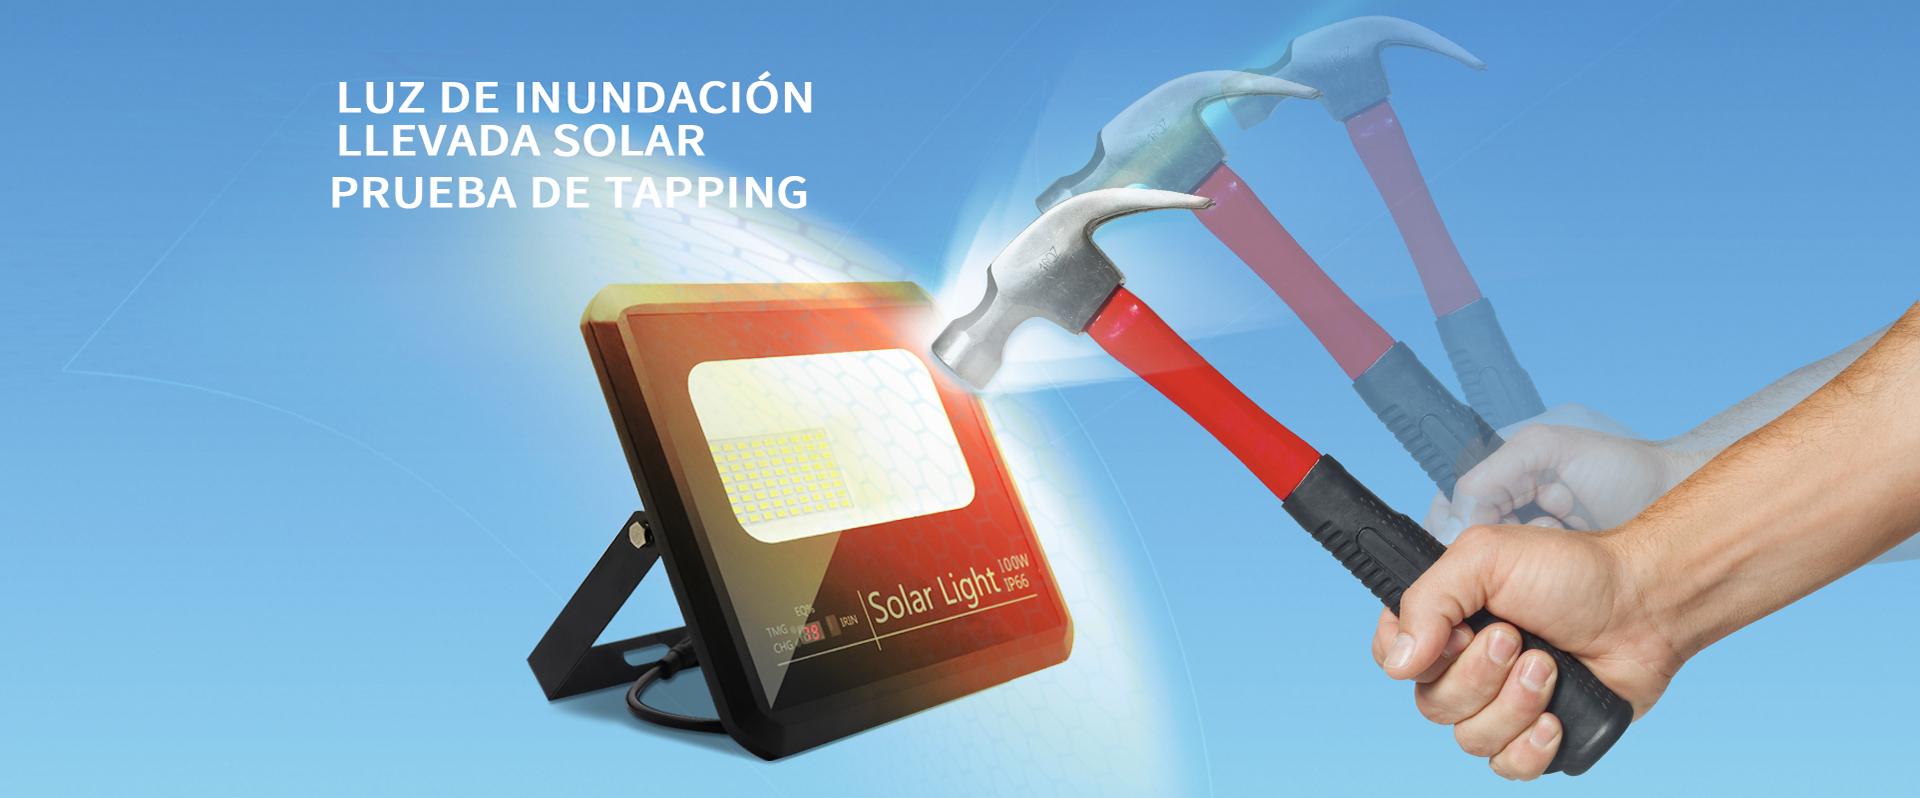 Fábrica de luz de inundación led solar